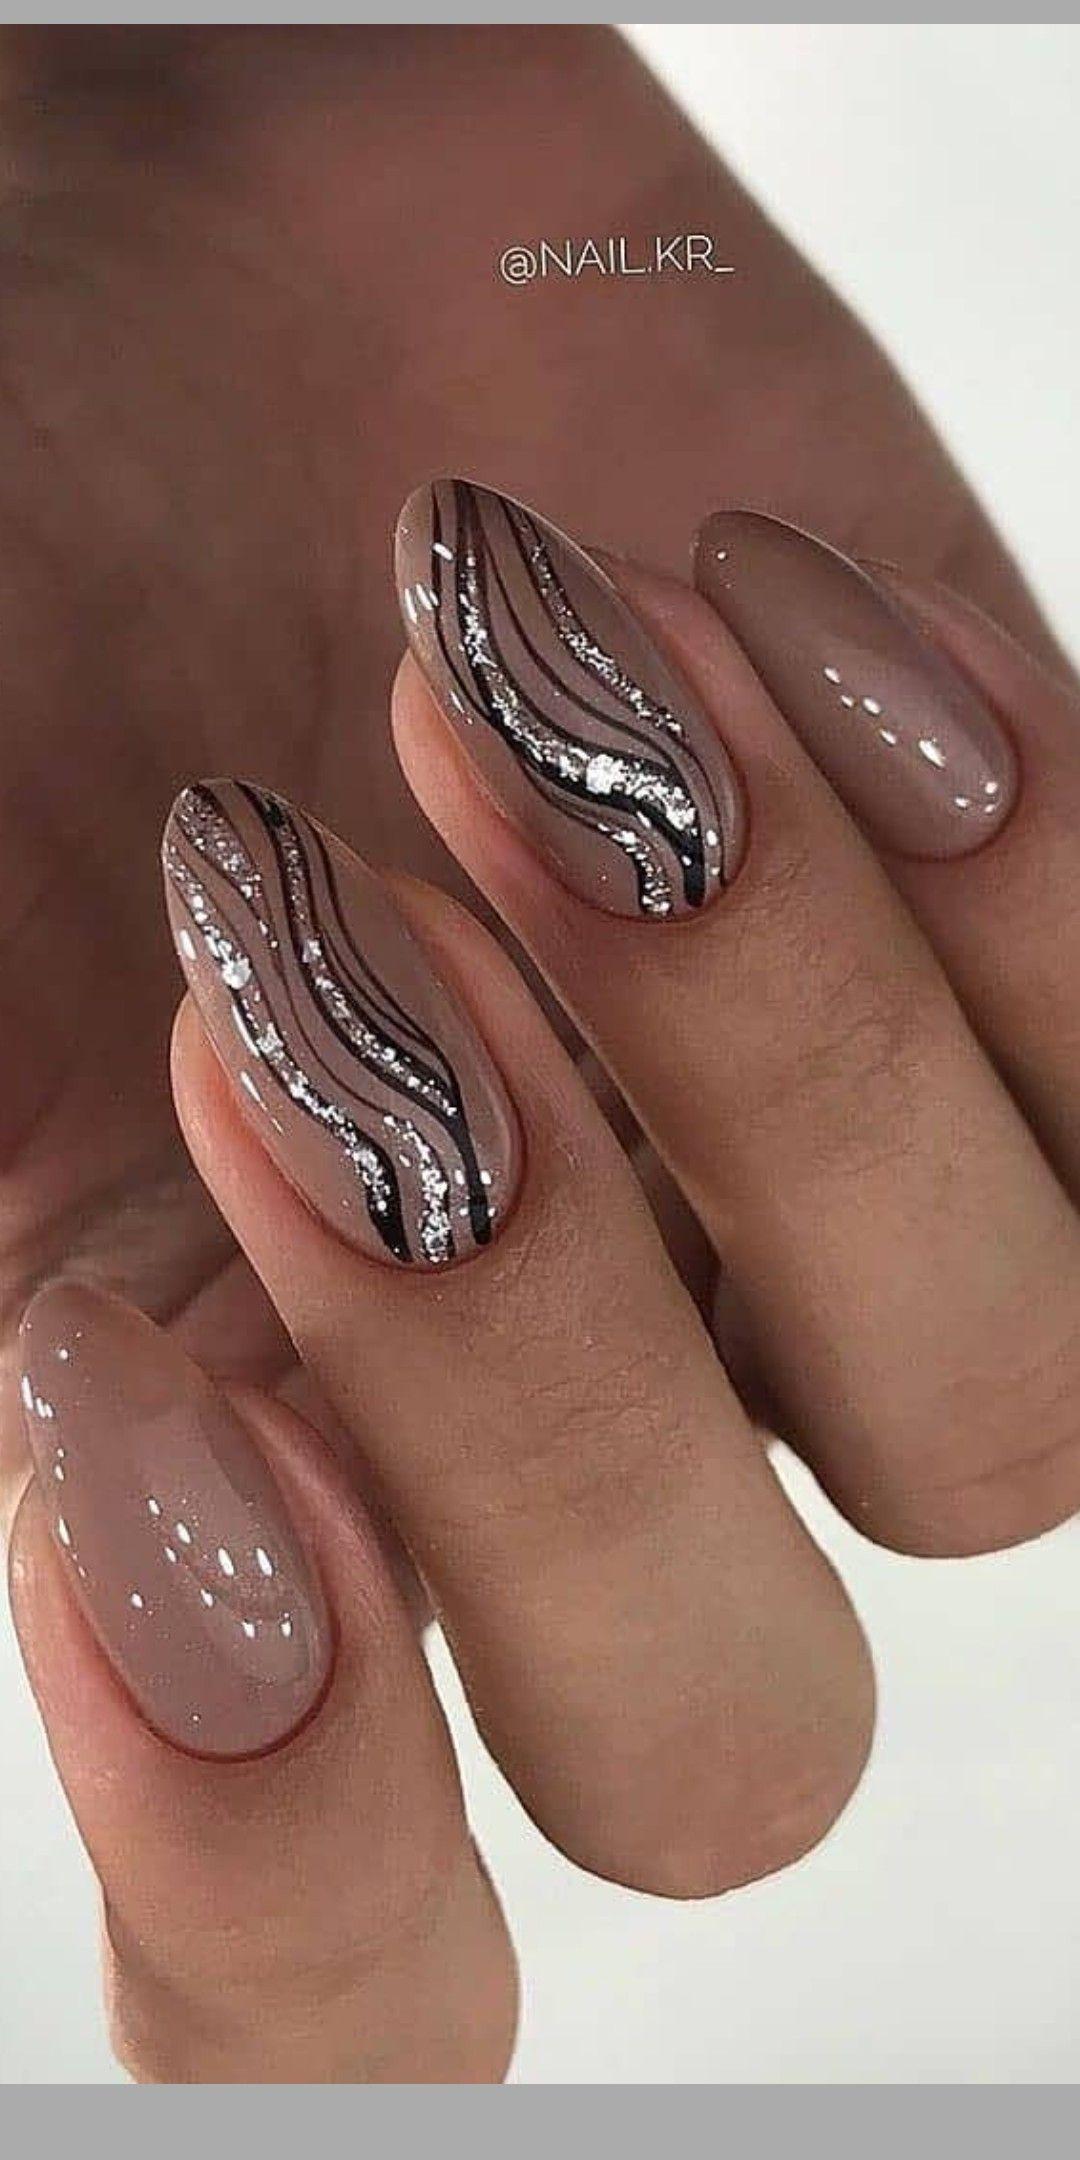 Pin By Irina Zhukovska On Manikyur In 2020 Pretty Nail Art Designs Nail Designs Nail Manicure